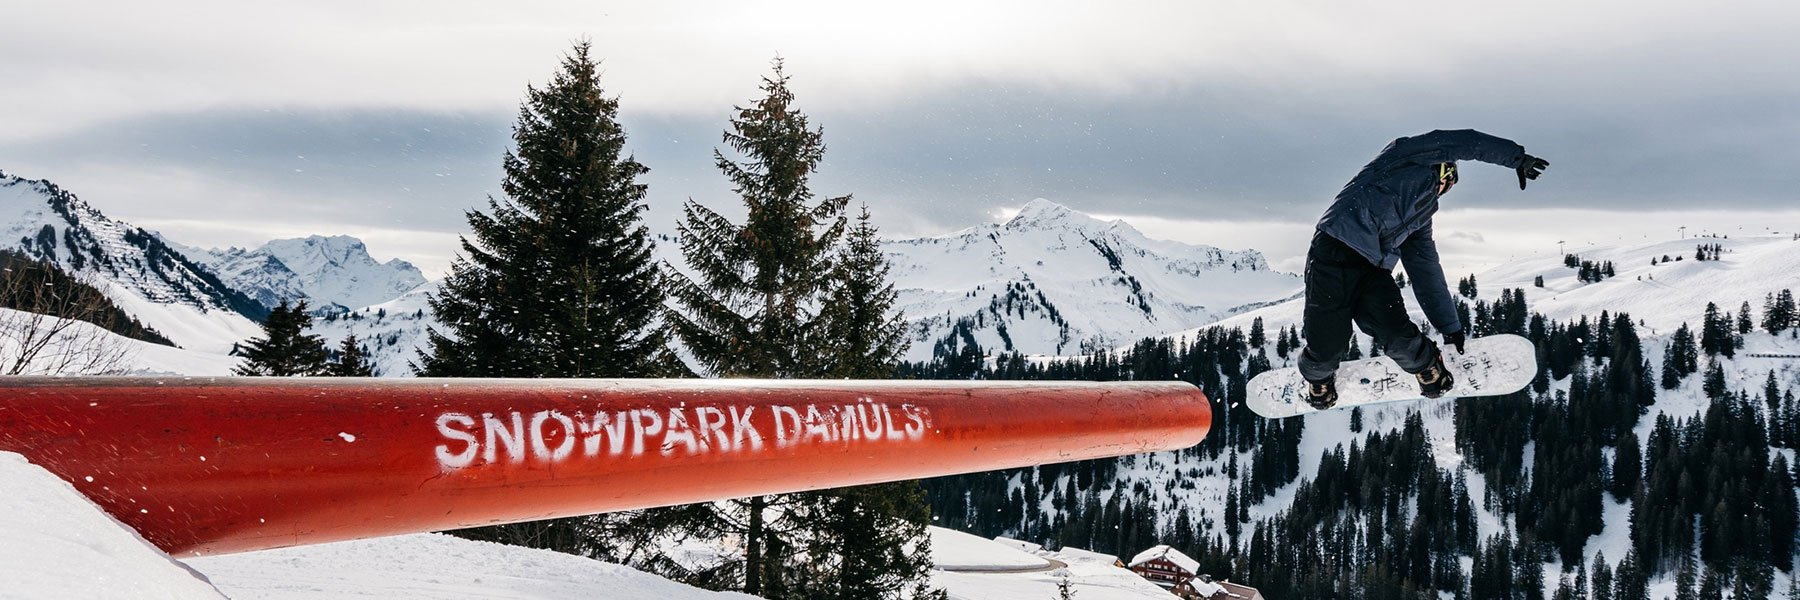 Snowpark Damüls